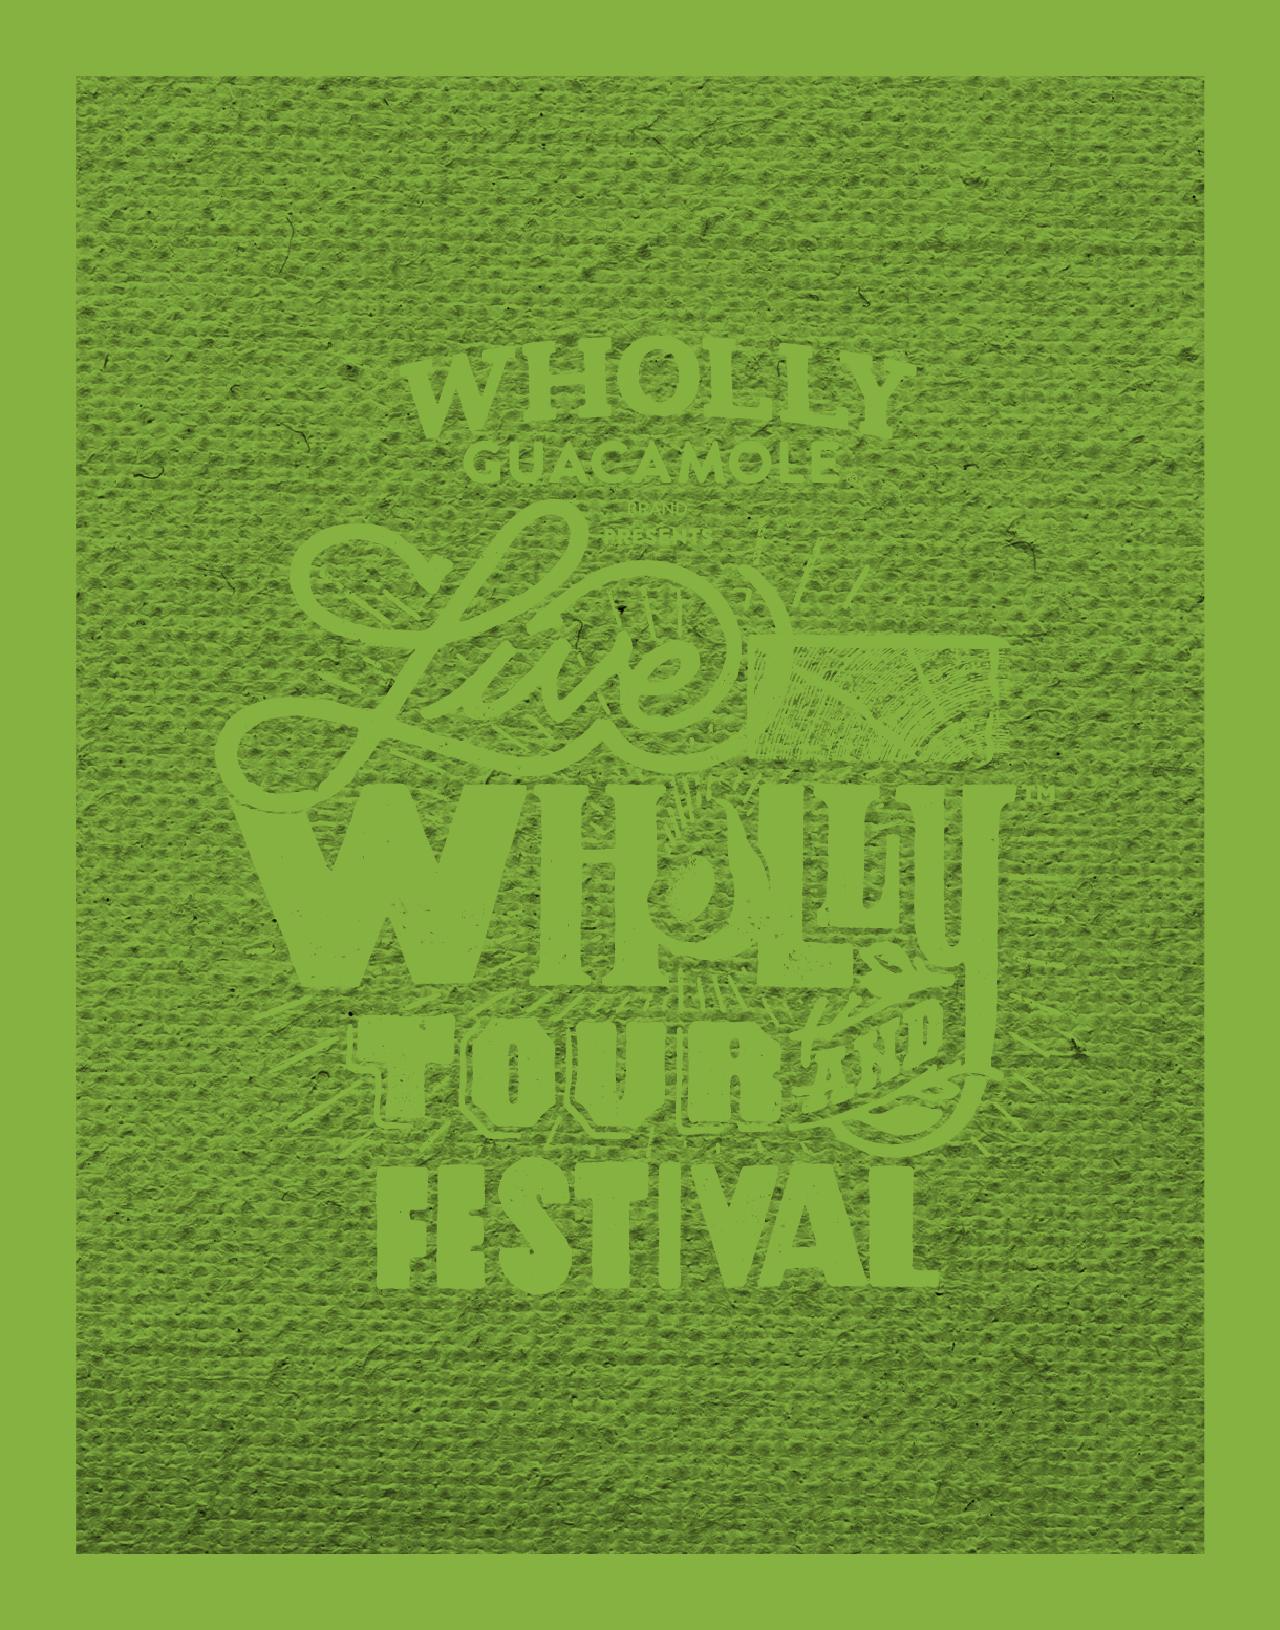 Live_Wholly_Tour_Content_Artboard 9.jpg